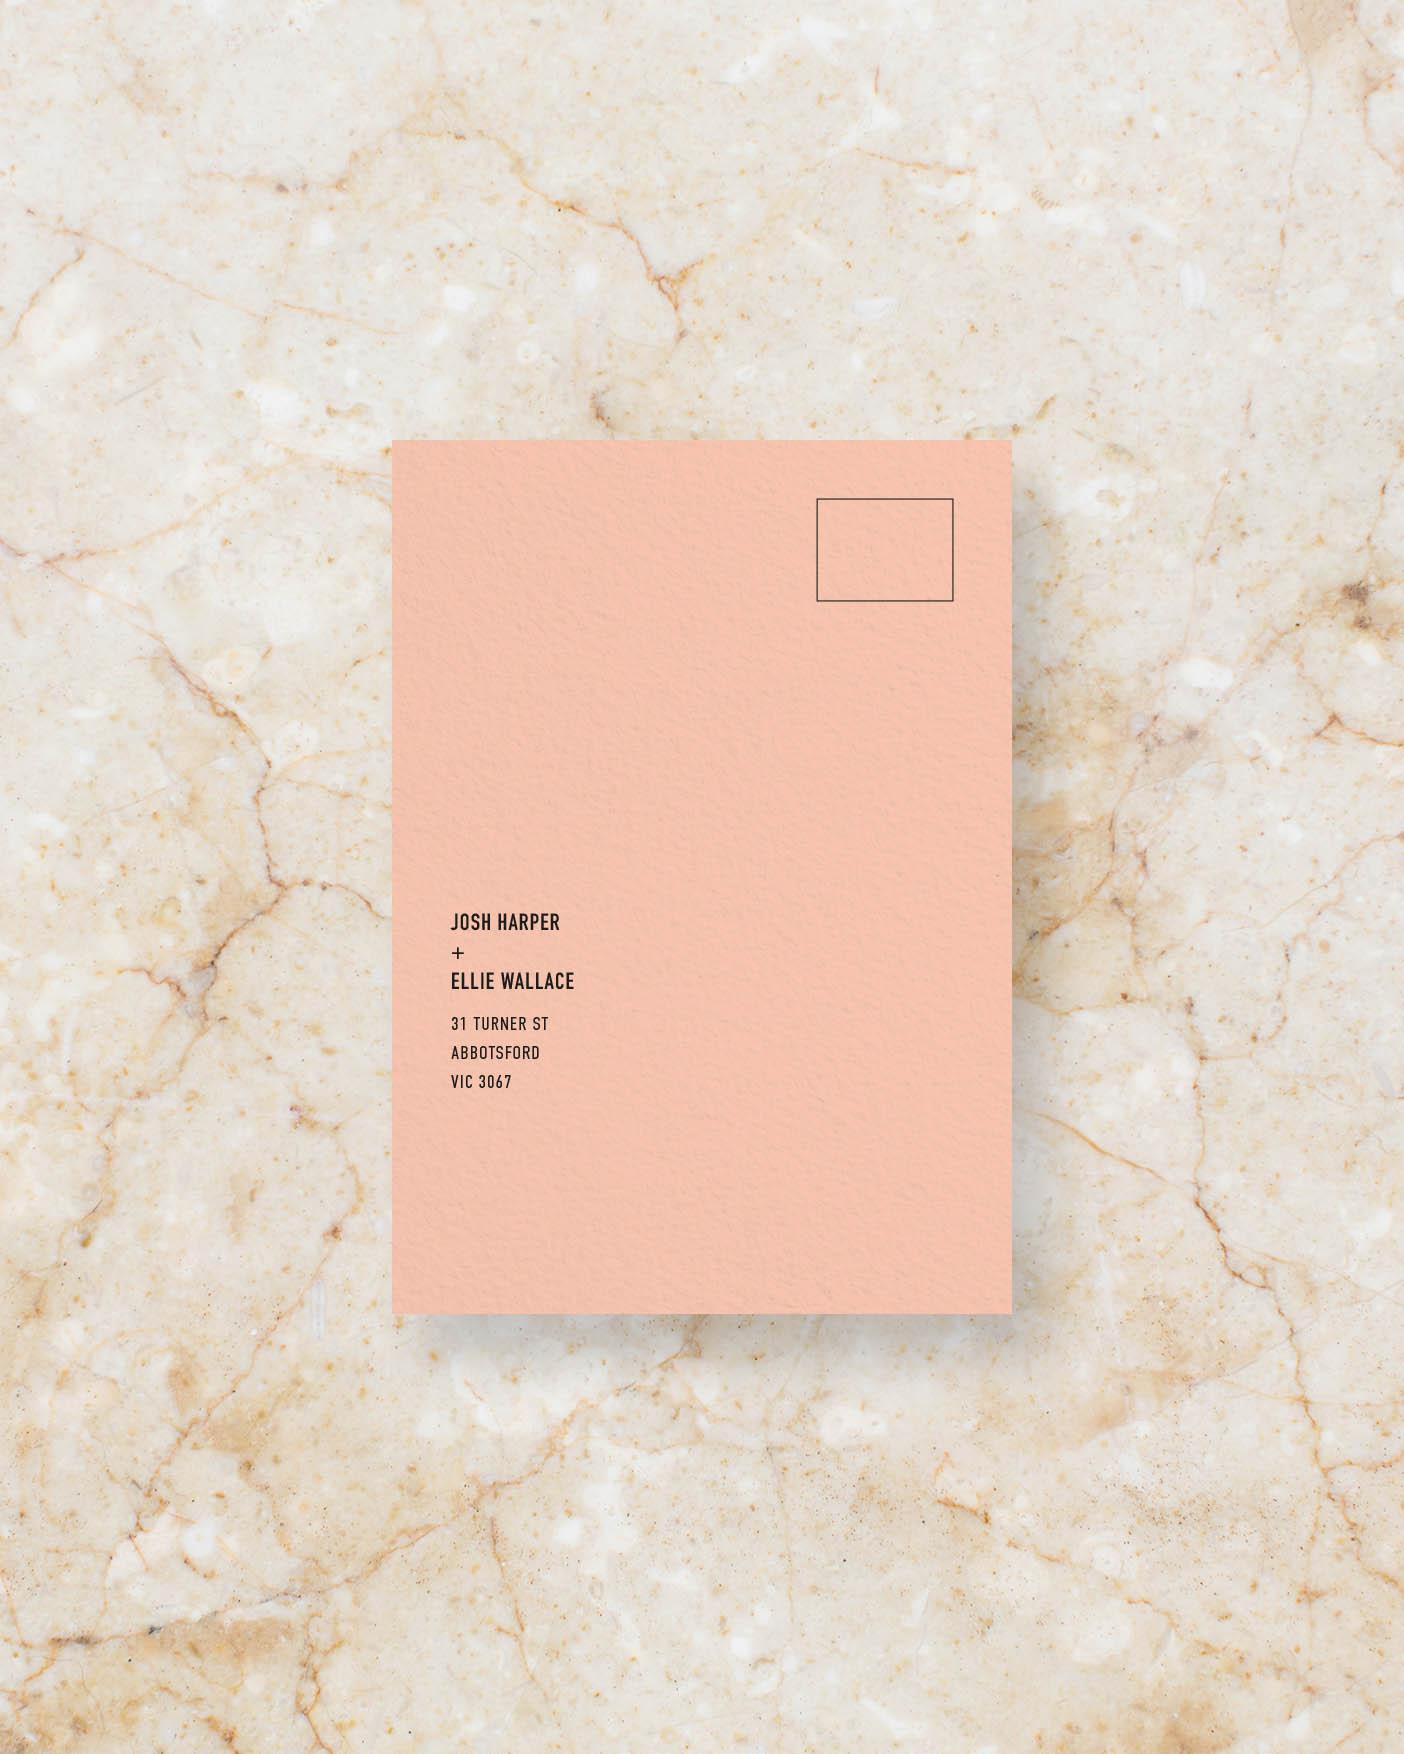 RSVP Card Front - Peach